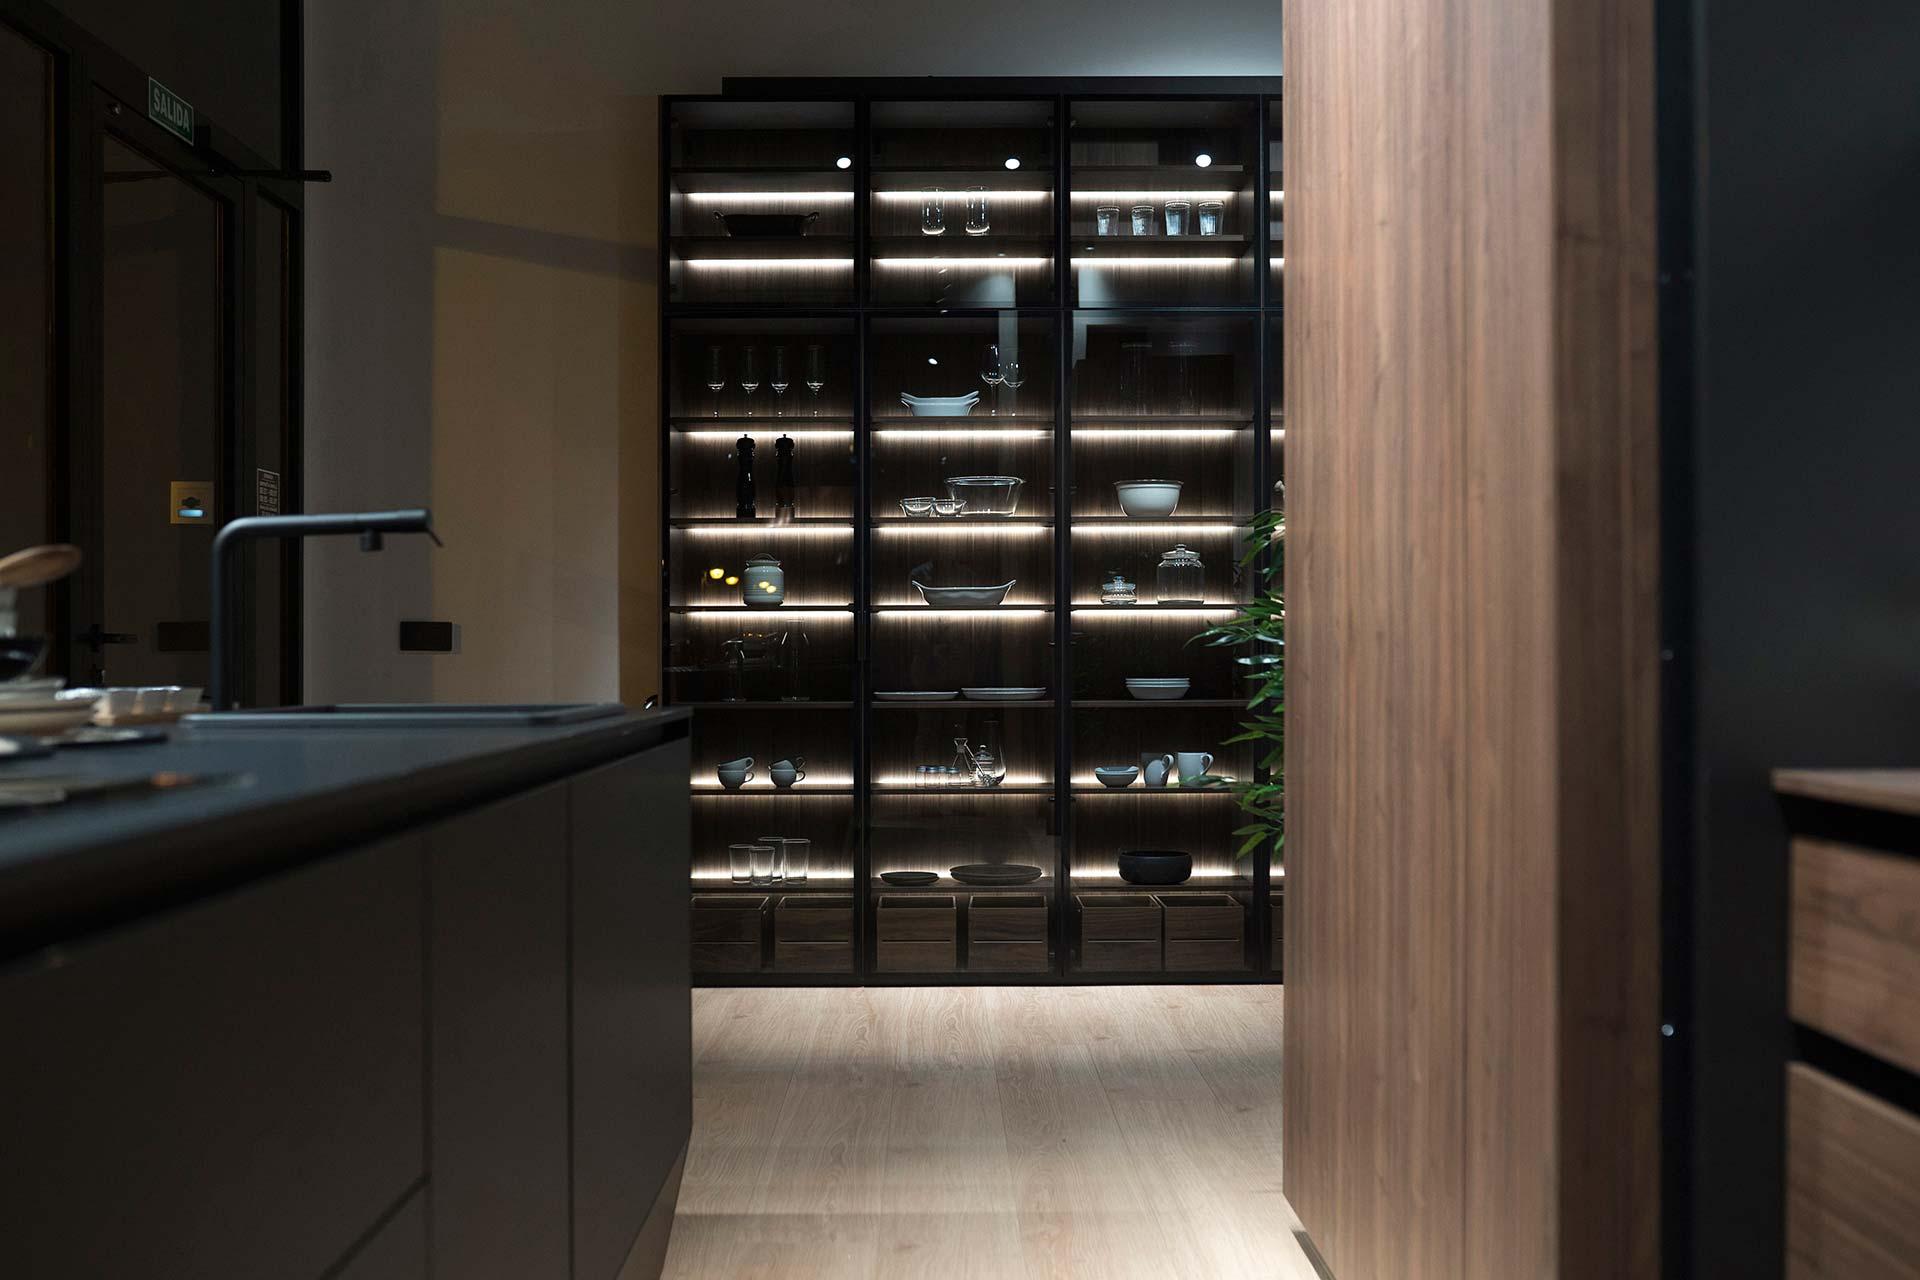 Santos Estudio Logroño, un nouveau magasin de cuisines Santos à La Rioja